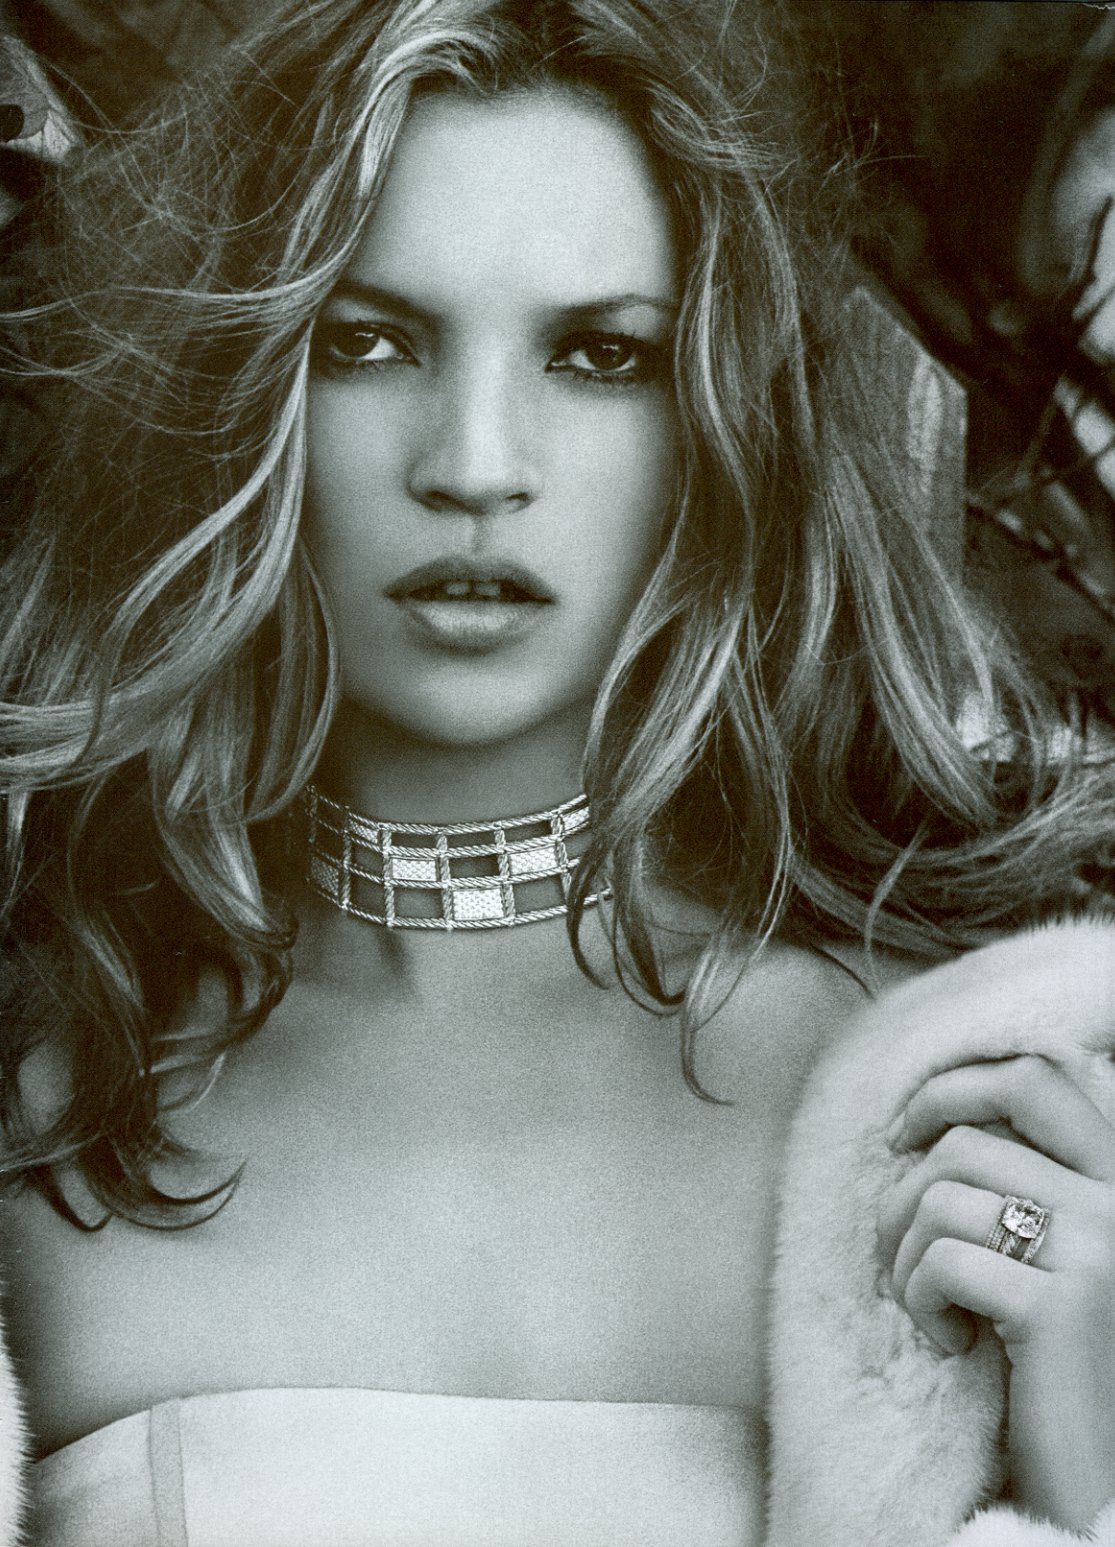 http://2.bp.blogspot.com/_GCAuqodmOE4/TRJhtiiLFHI/AAAAAAAAF4w/kLTxuWH1CPM/s1600/Model+Kate+Moss+%25281%2529.jpg